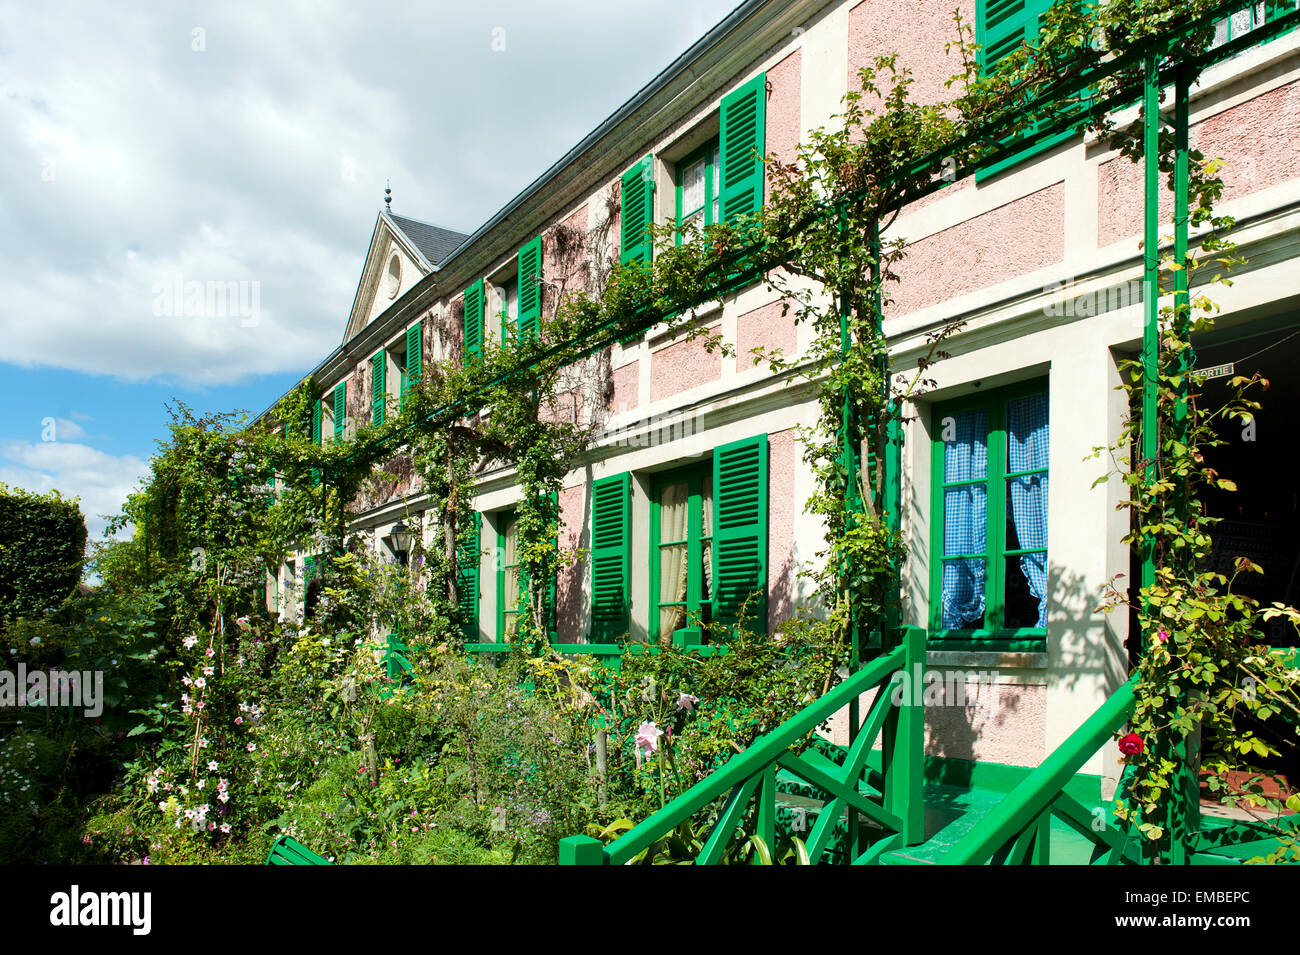 Claude Monet Haus  Giverny Departement Eure Frankreich Europa | Claude Monet Haus giverny departement eure france Stock Photo